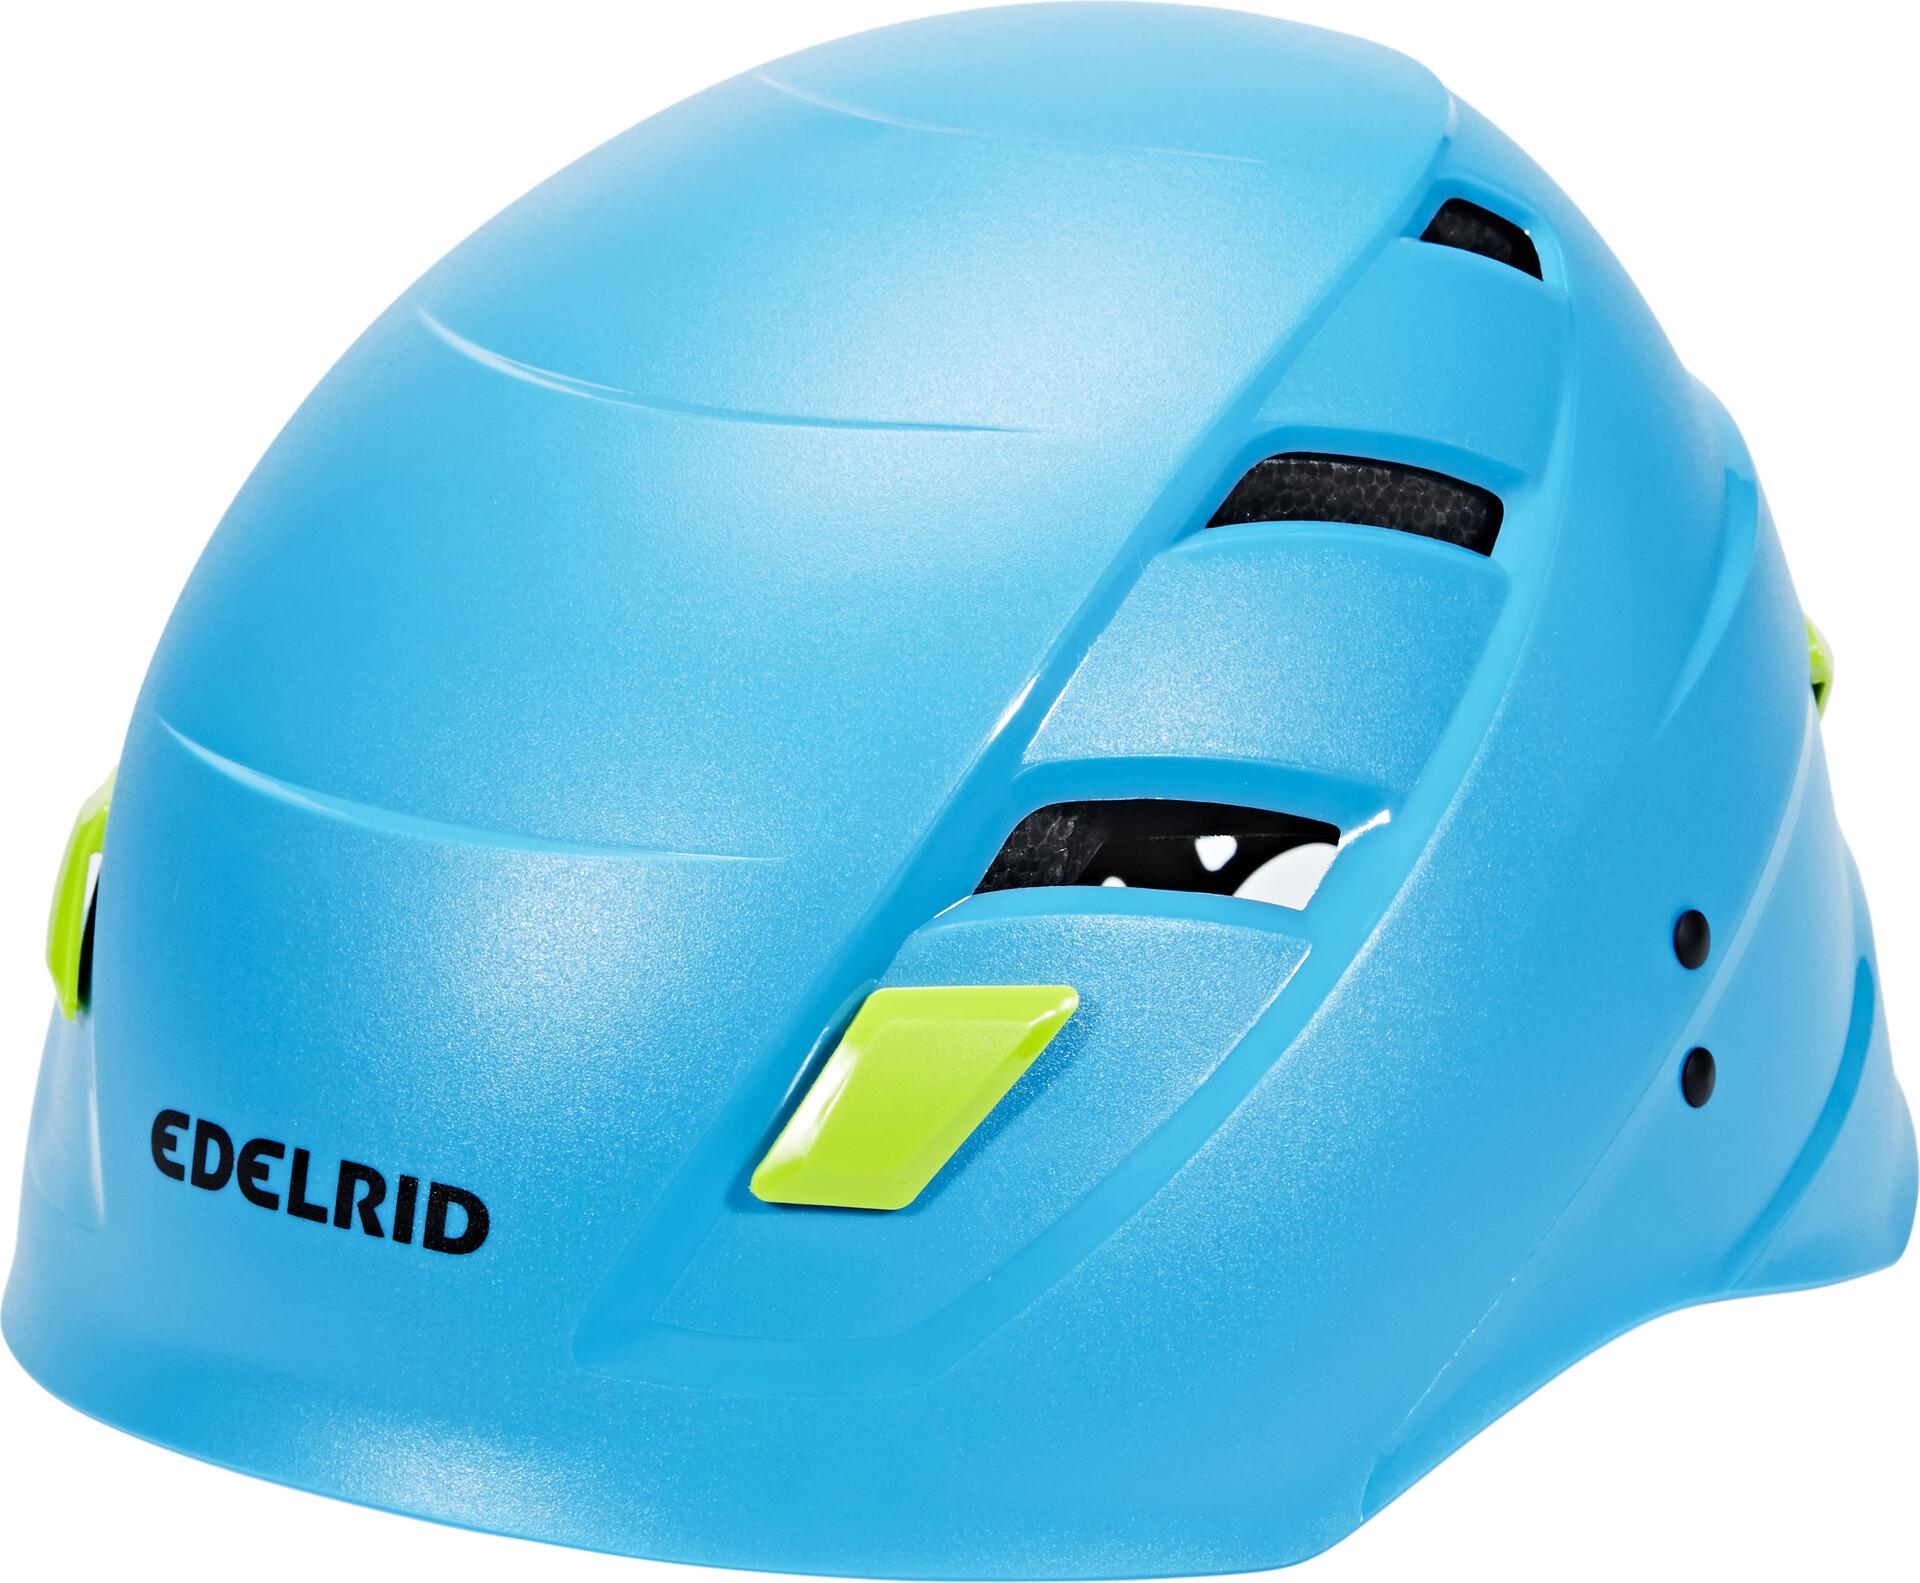 Edelrid Klettergurt Wing : Edelrid zodiac helmet icemint campz